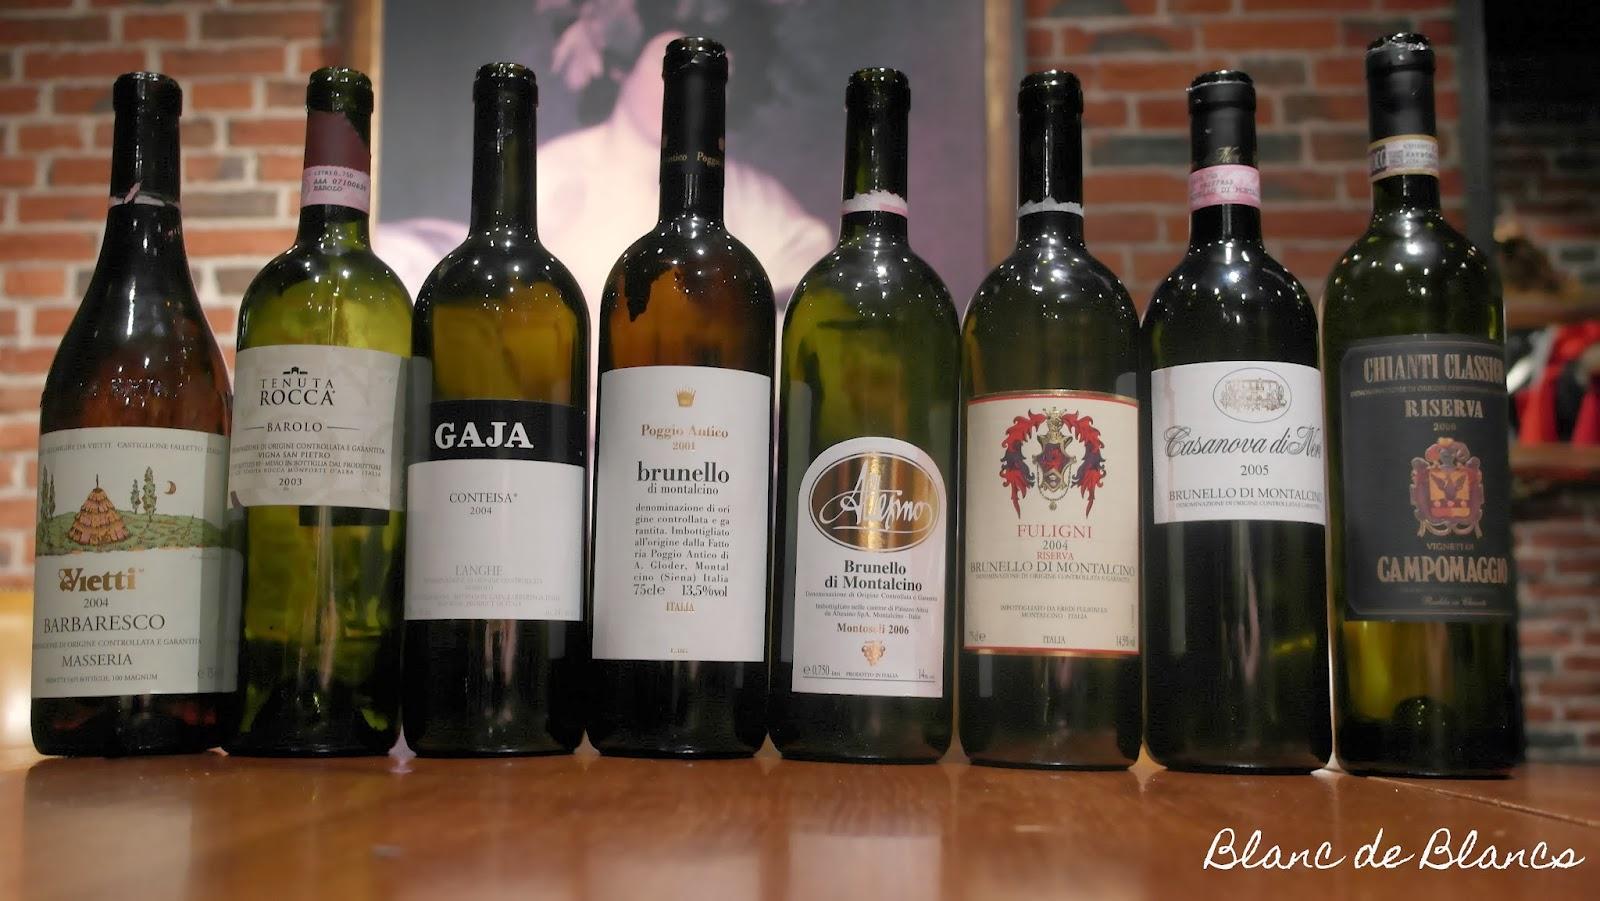 Piemonte & Brunello di Montalcino -tasting - Blanc de Blancs